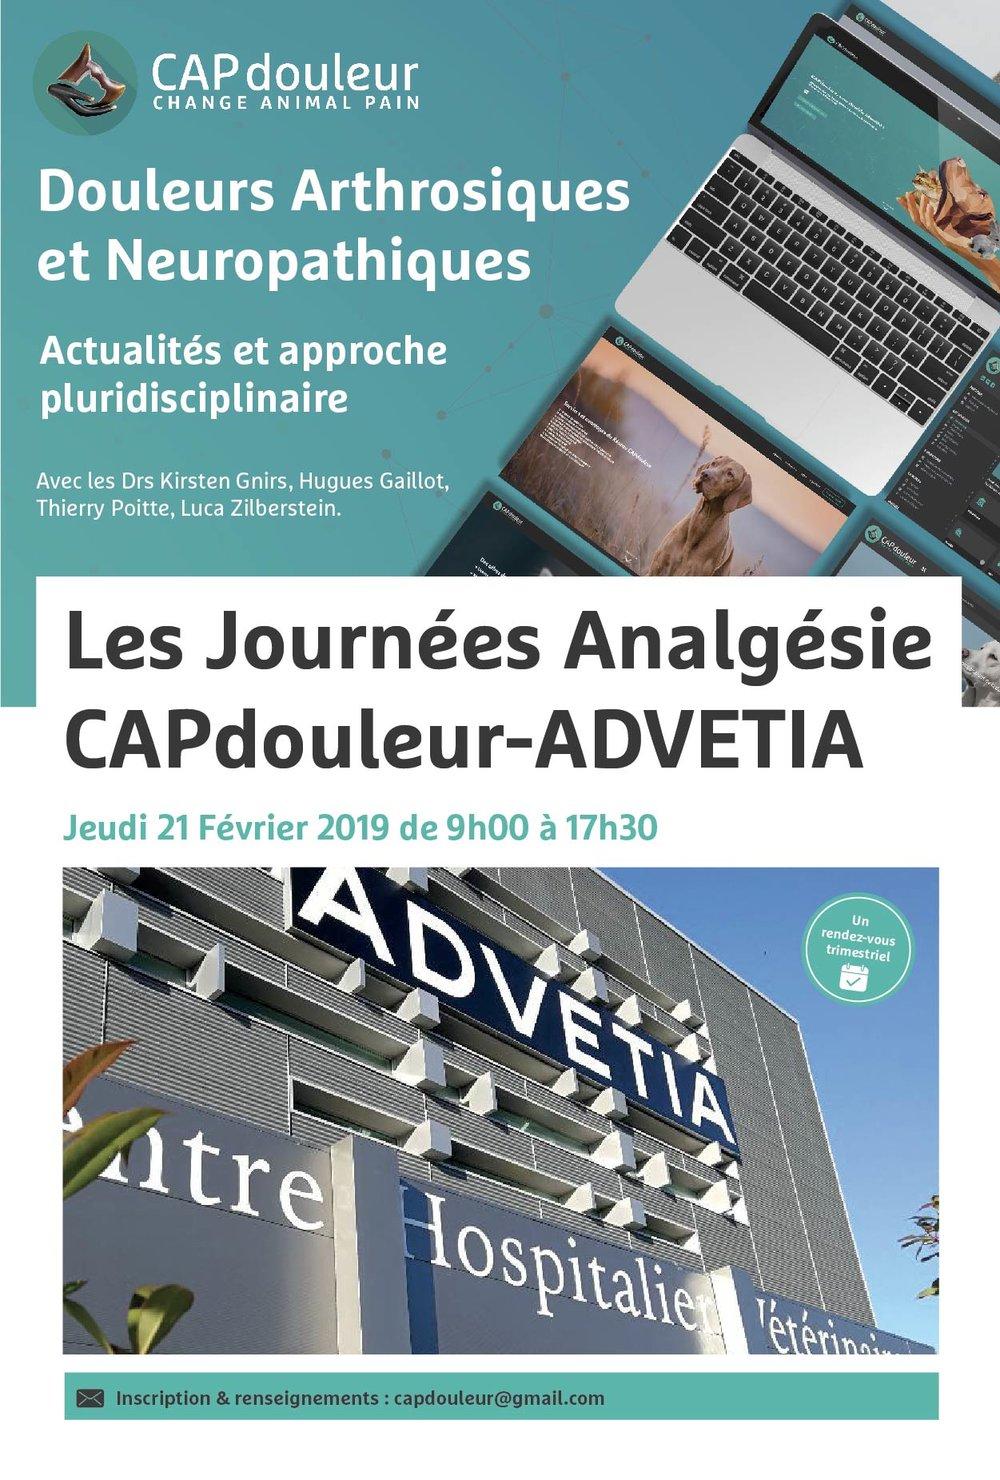 NewsletteAdvetia-2019_Plan de travail 1 copie 9.jpg